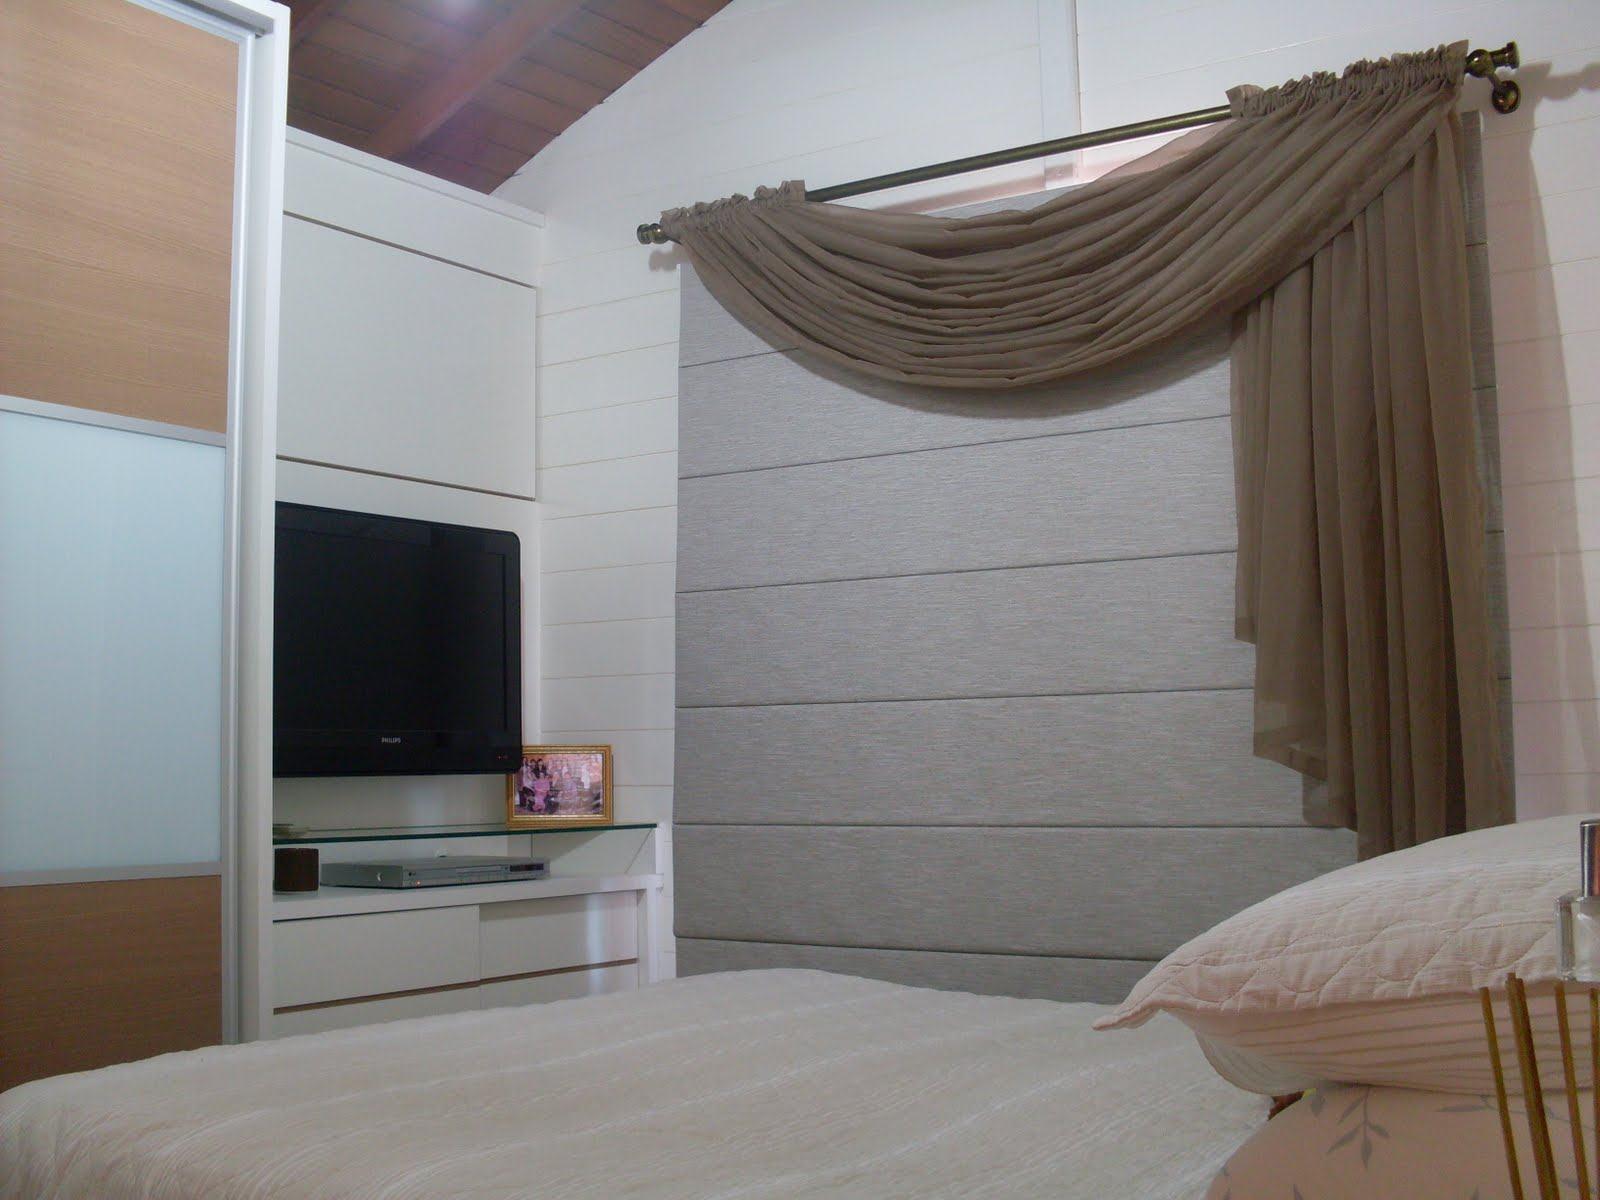 cortina romana para quarto 5